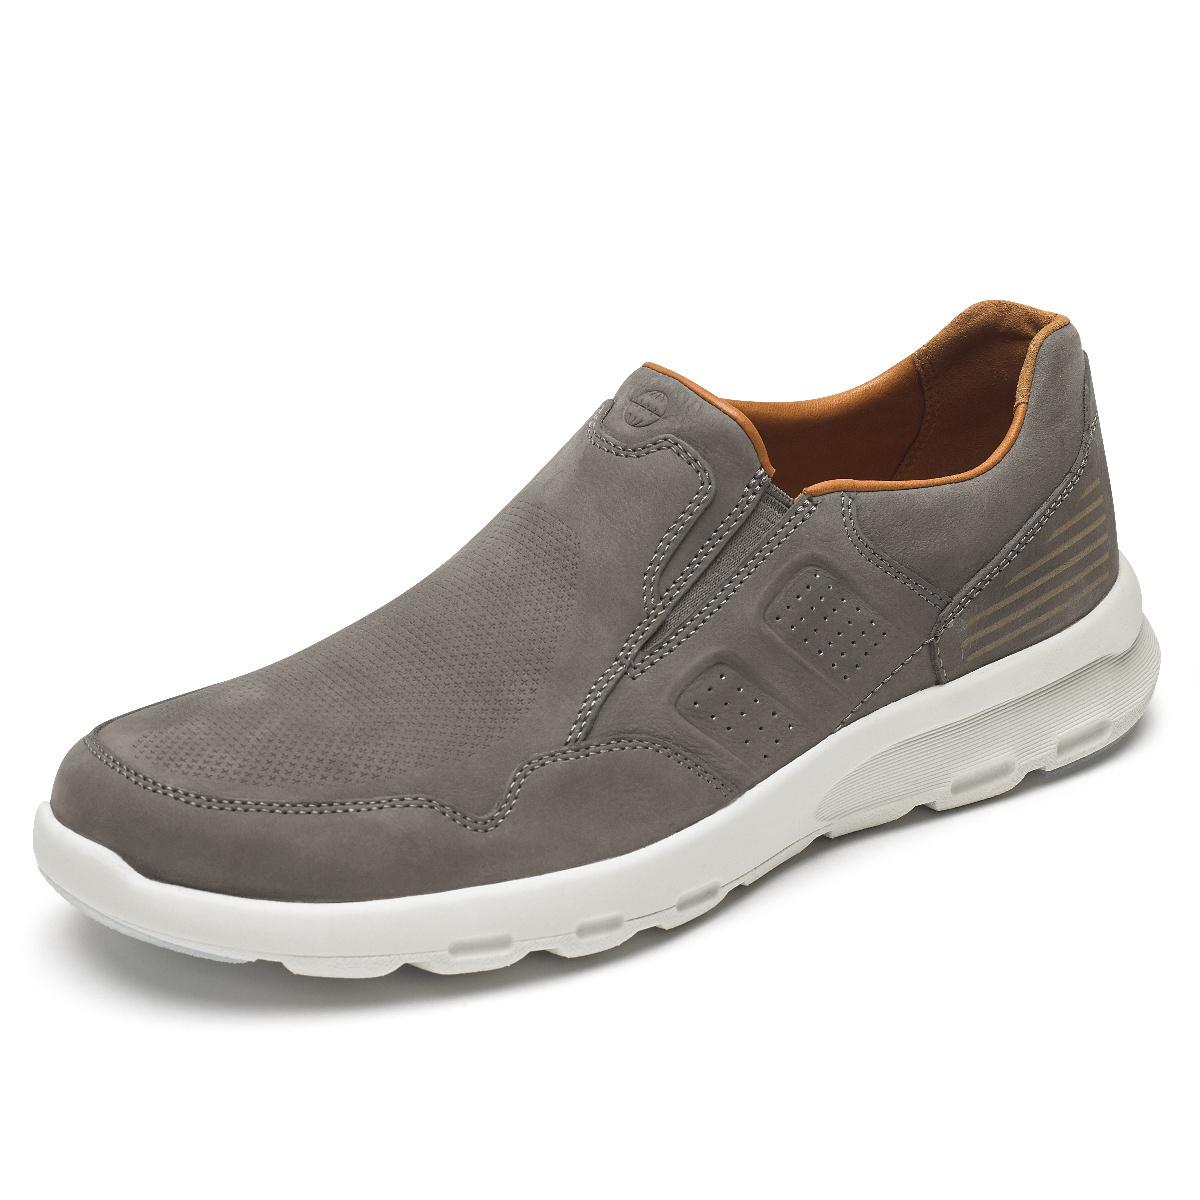 rockport slip on sneakers